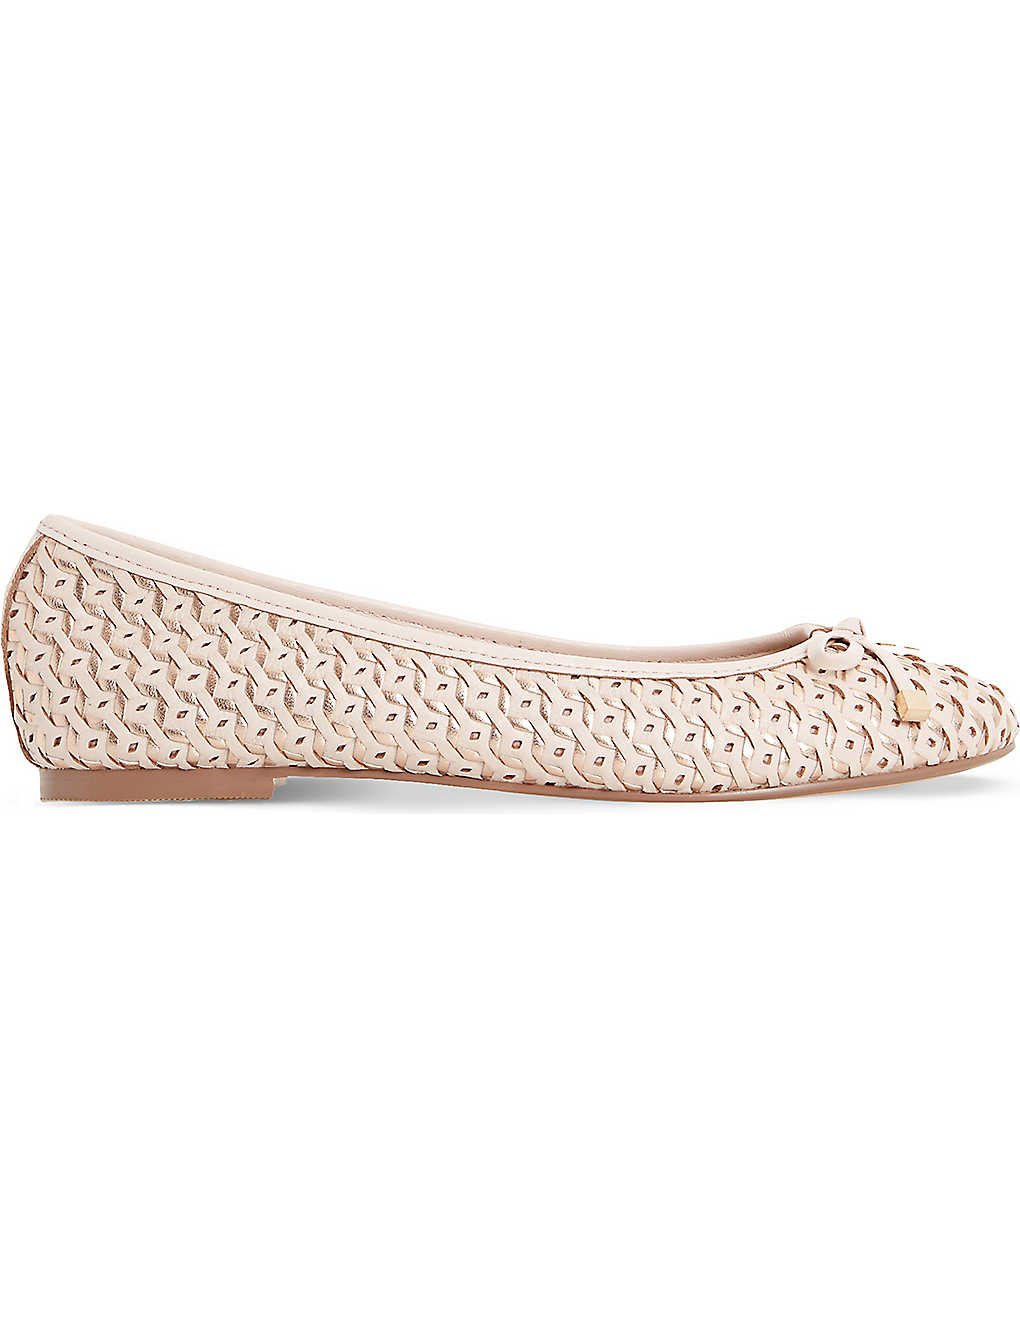 e14399a5f55 DUNE - Hobbi woven leather ballet flats